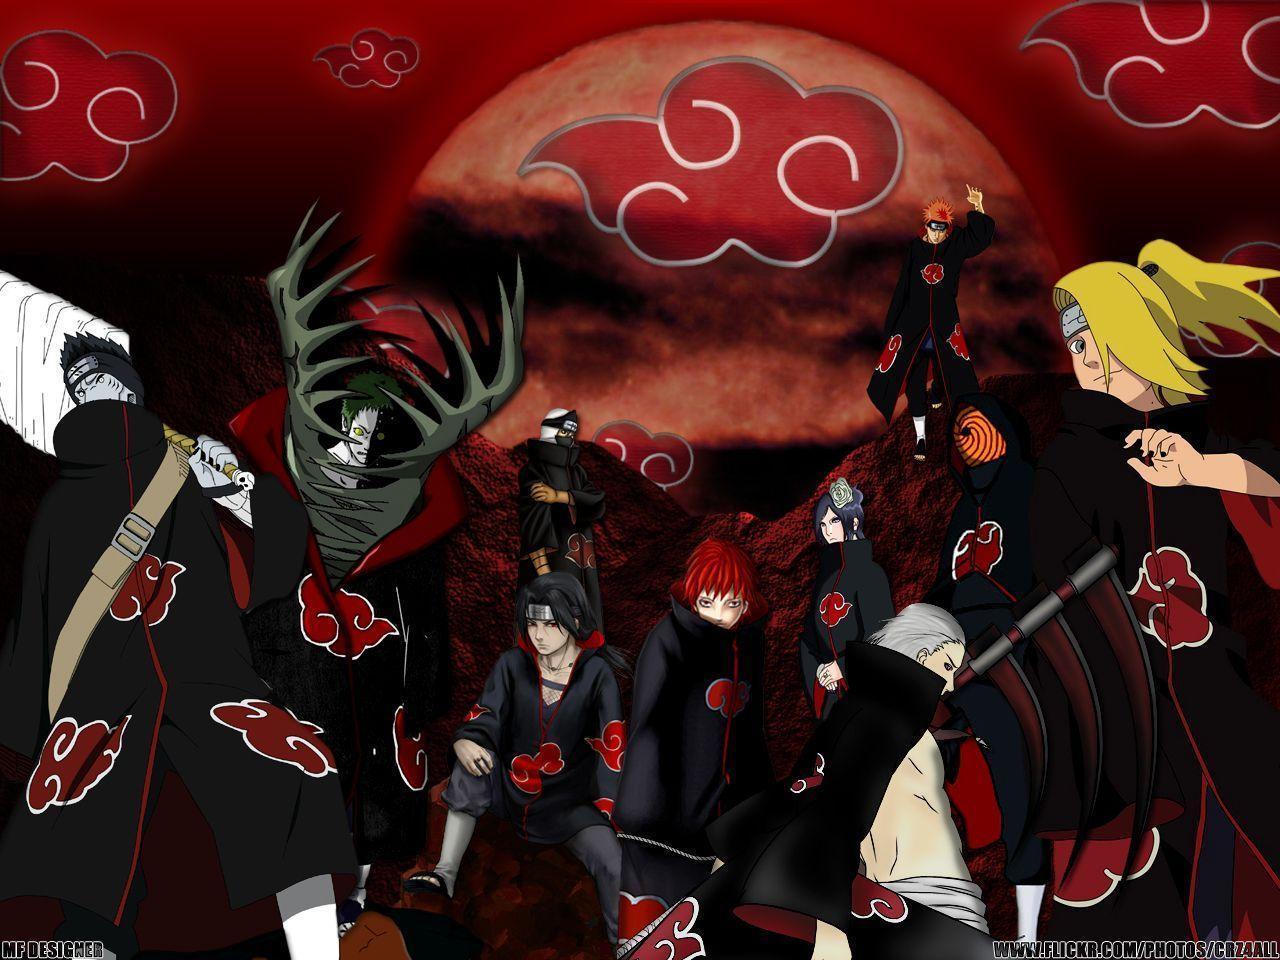 Naruto Akatsuki Wallpapers And Backgrounds 17008 HD Wallpapers ...